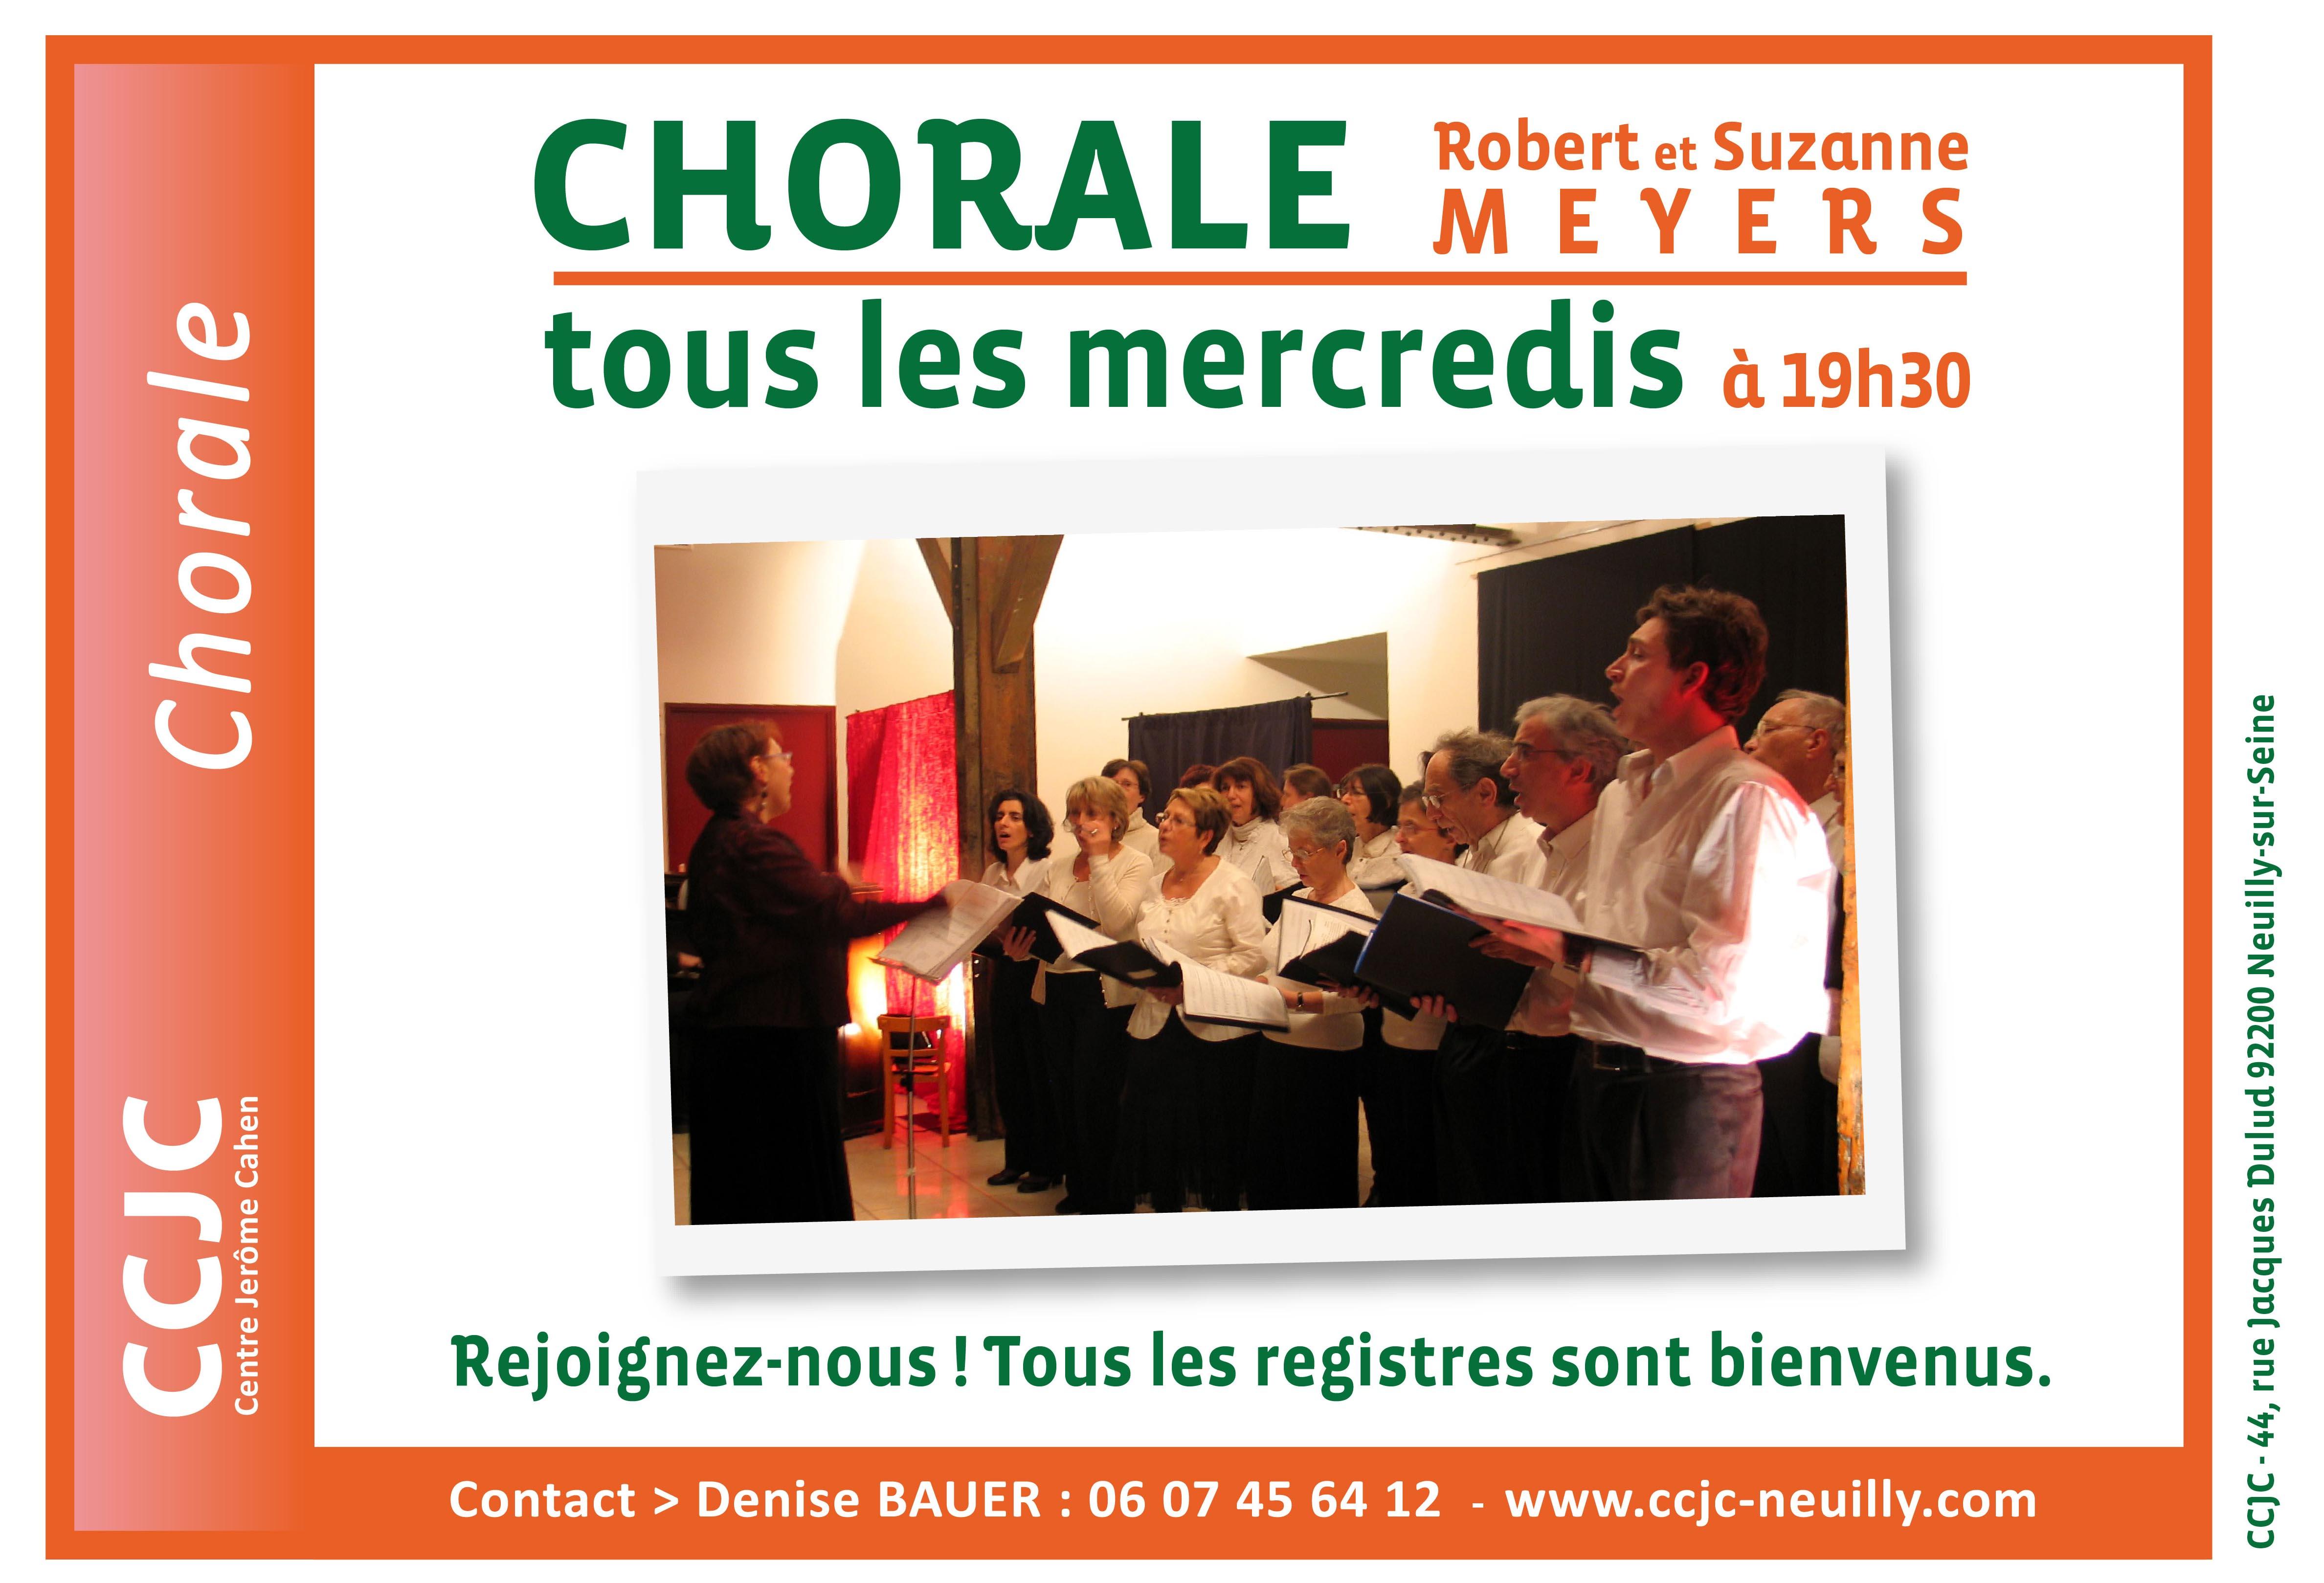 Chorale Robert et Suzanne Meyers, avec Rosy Farhat